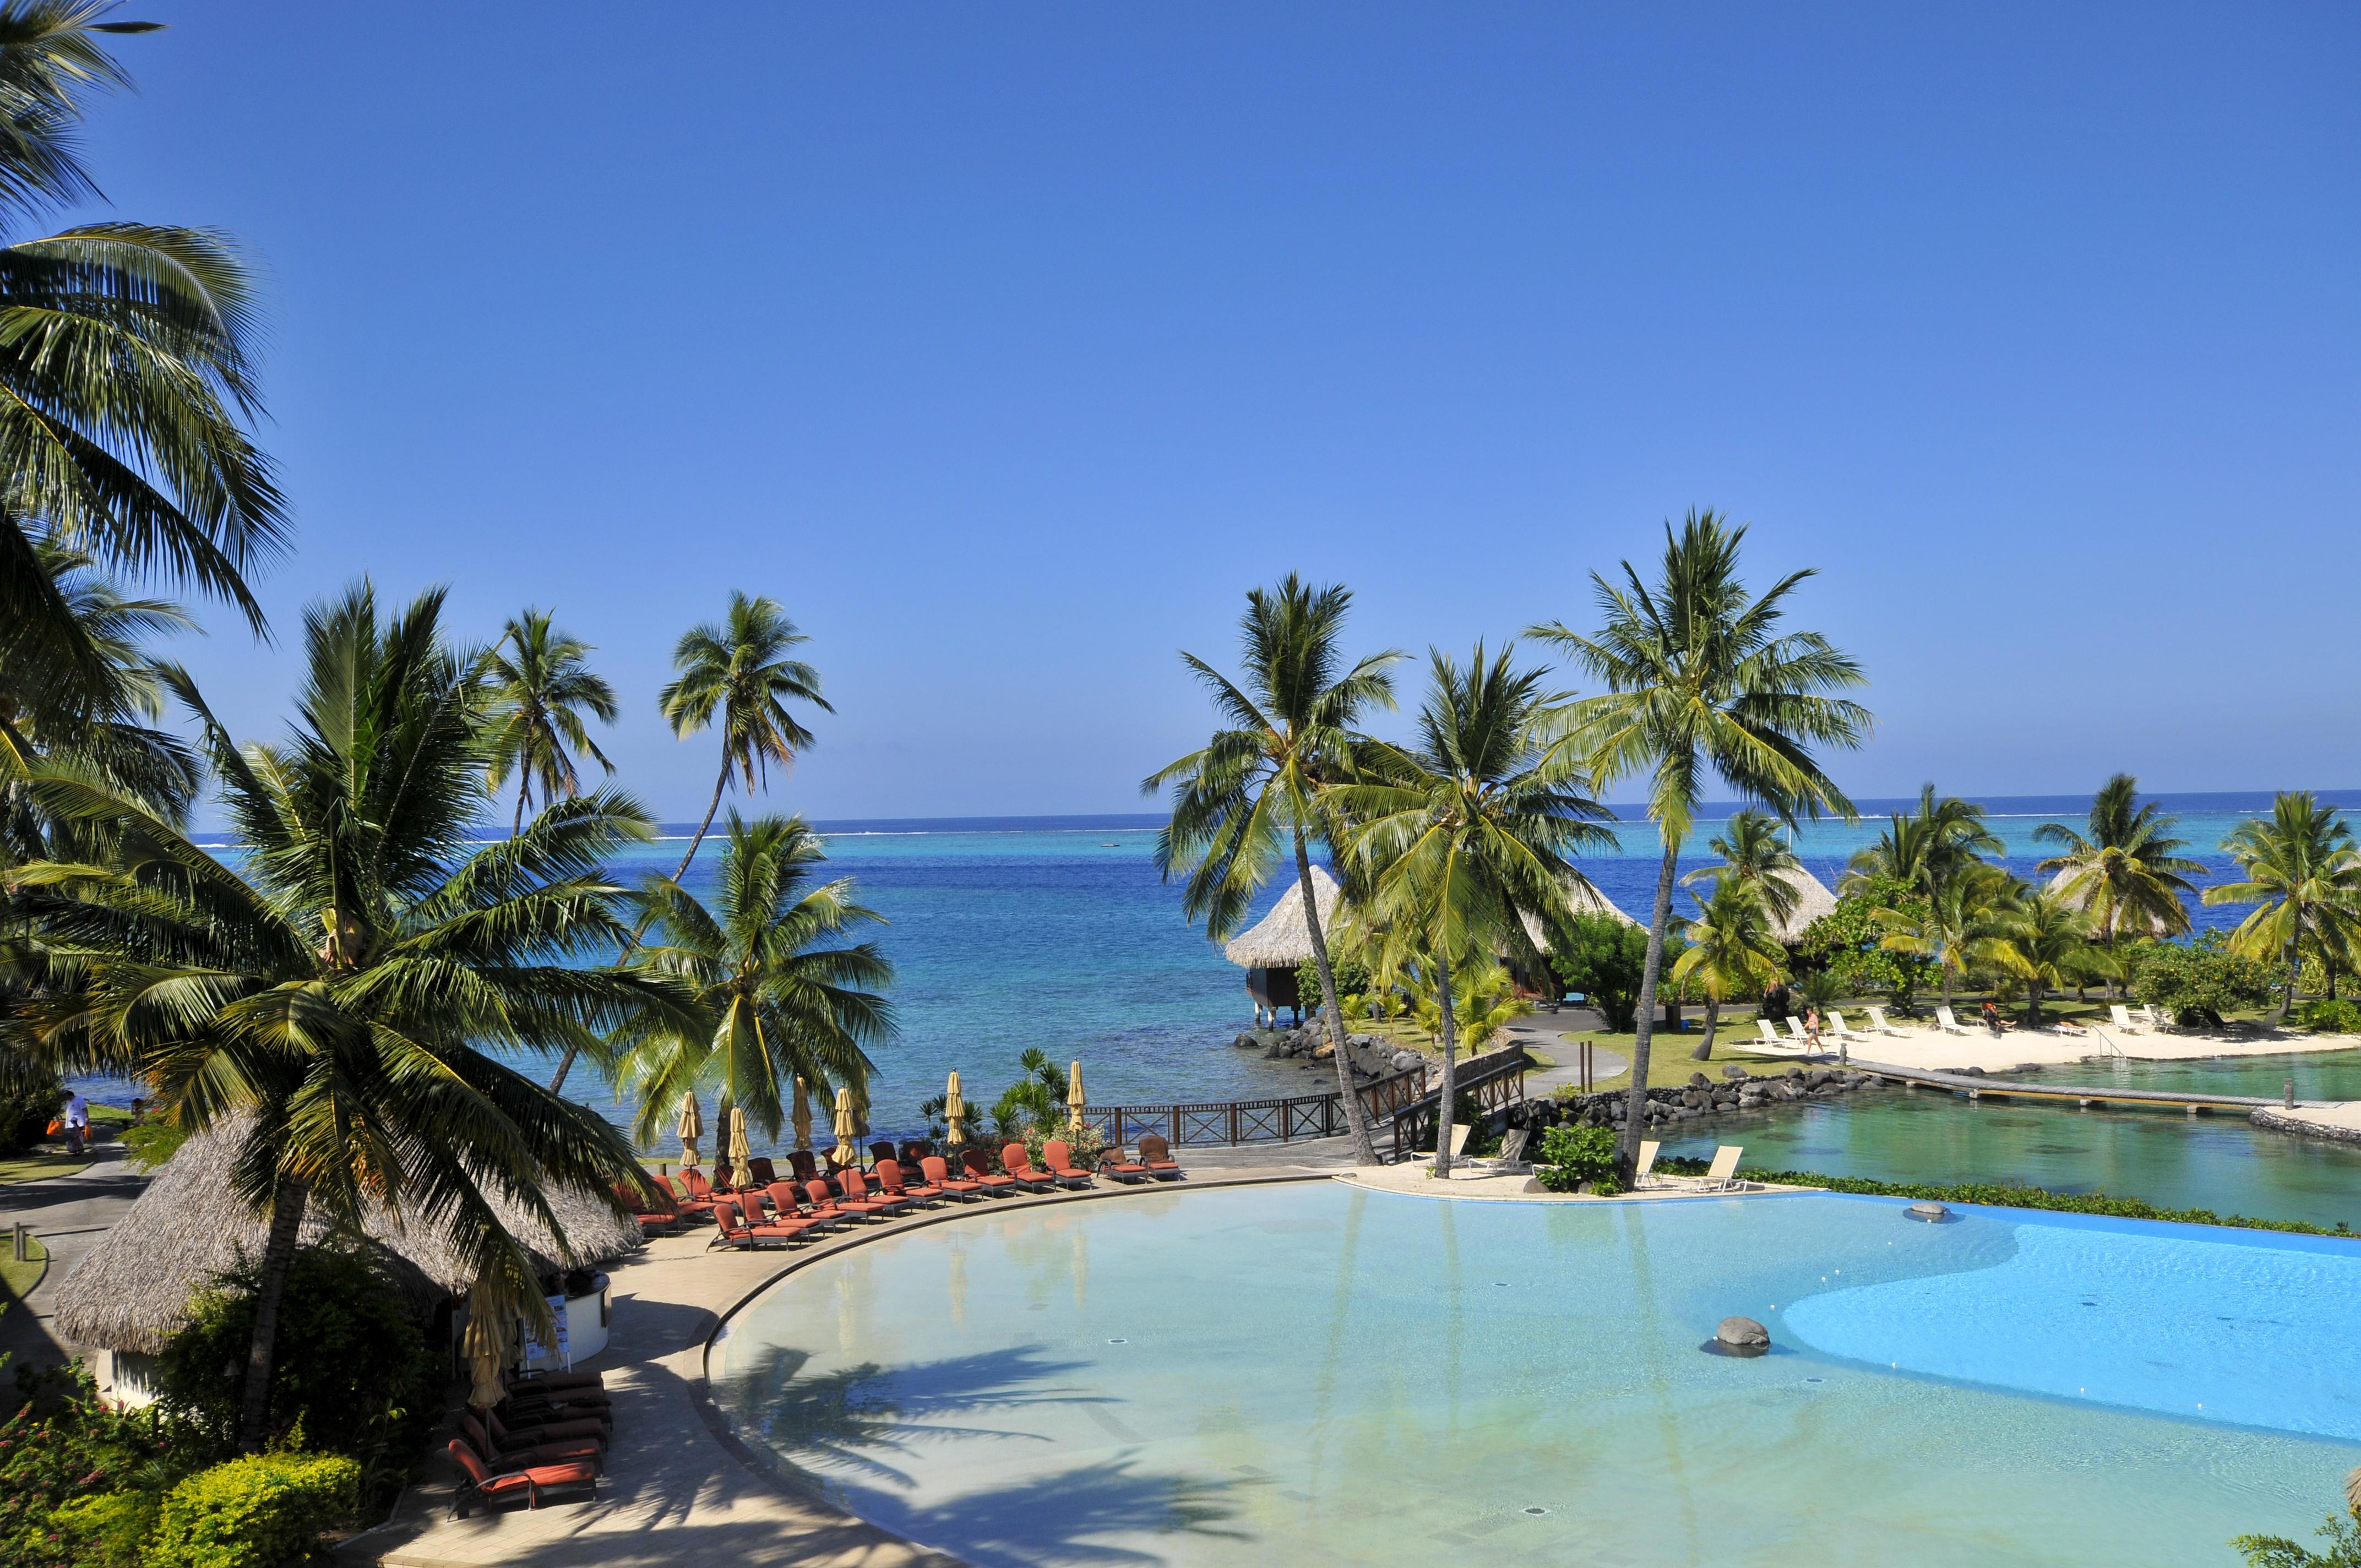 Vacances de rêve à Tahiti